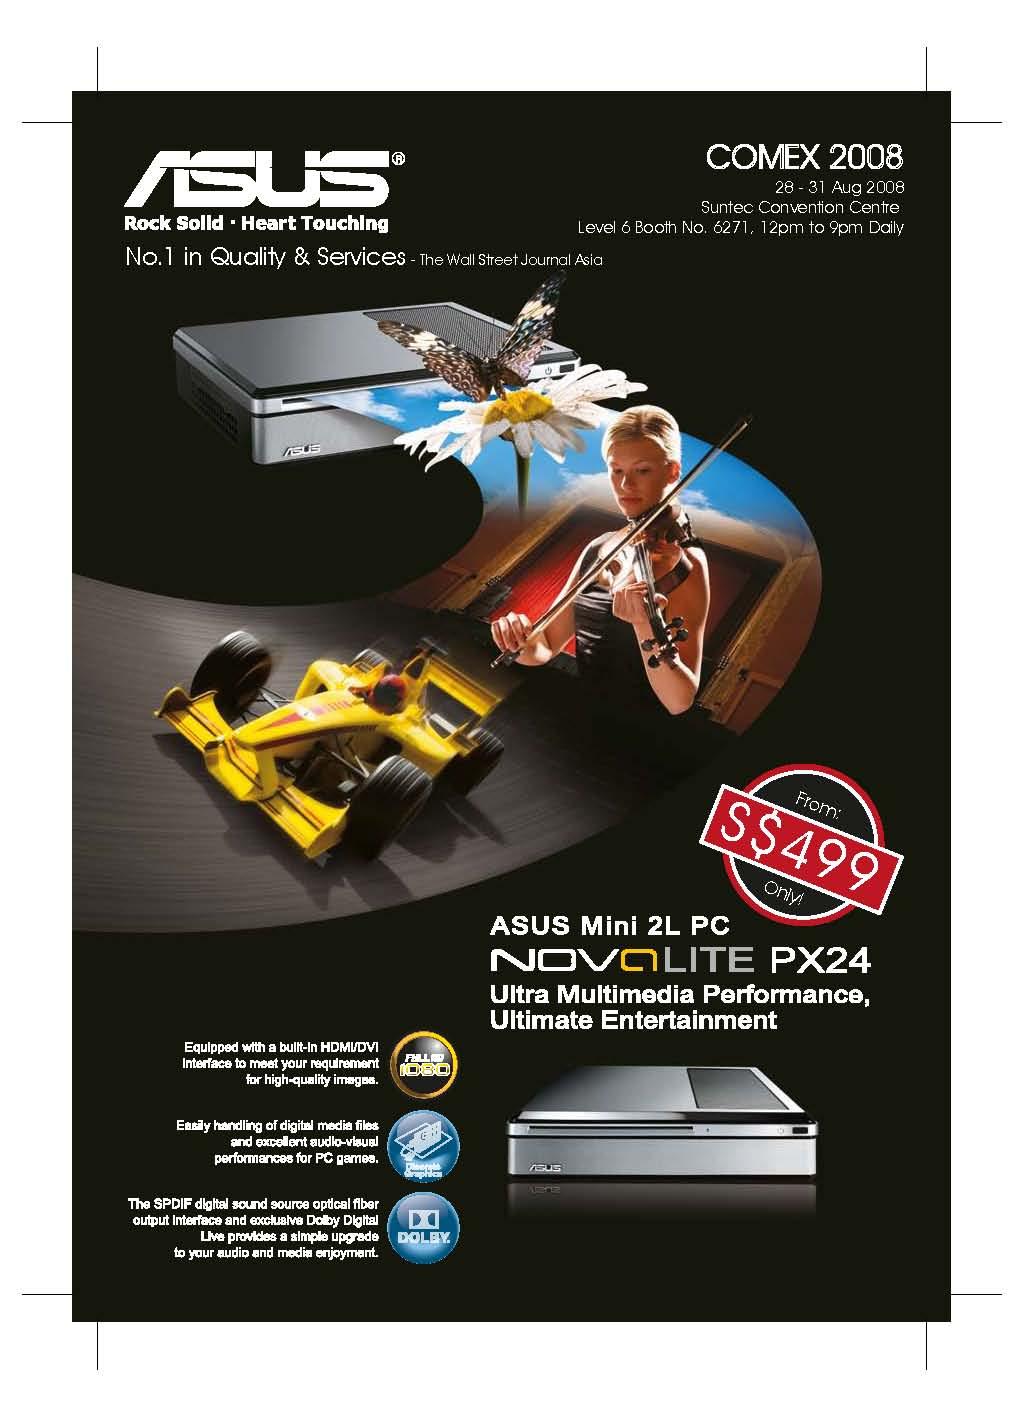 Comex 2008 price list image brochure of Asus Nova Lite Px24 1